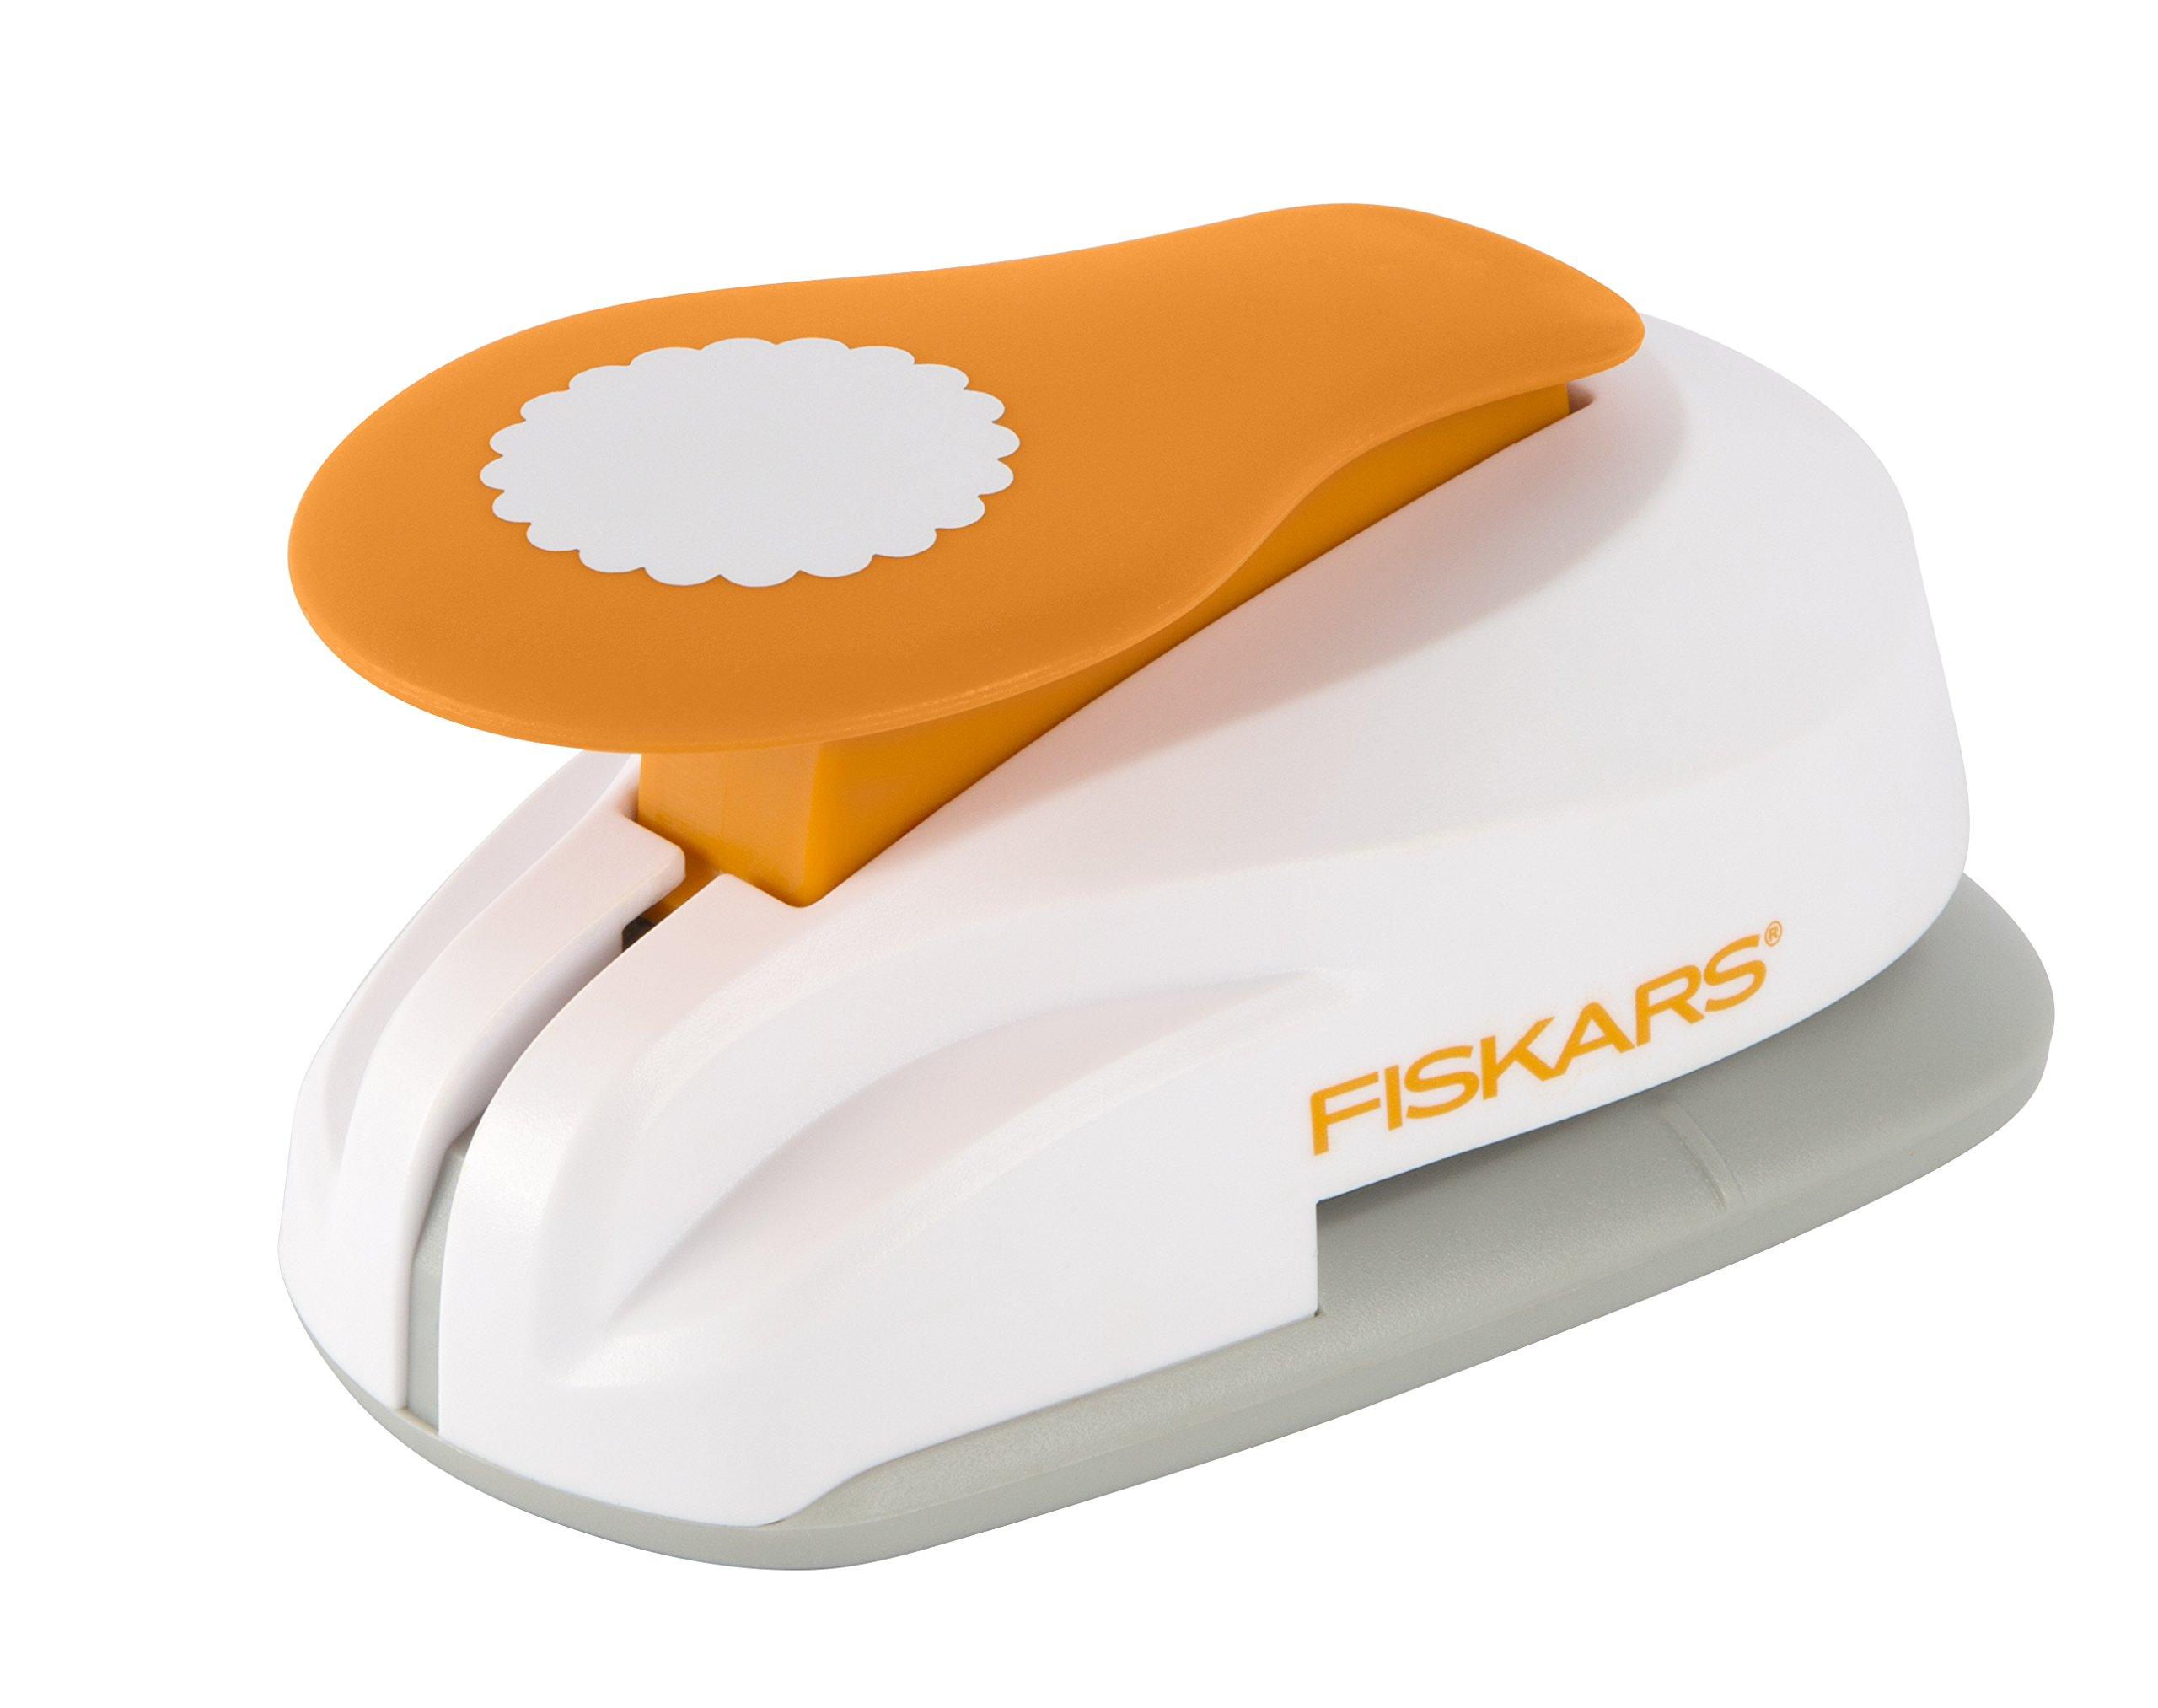 Fiskars X-Large Lever Punch, Scalloped Circle